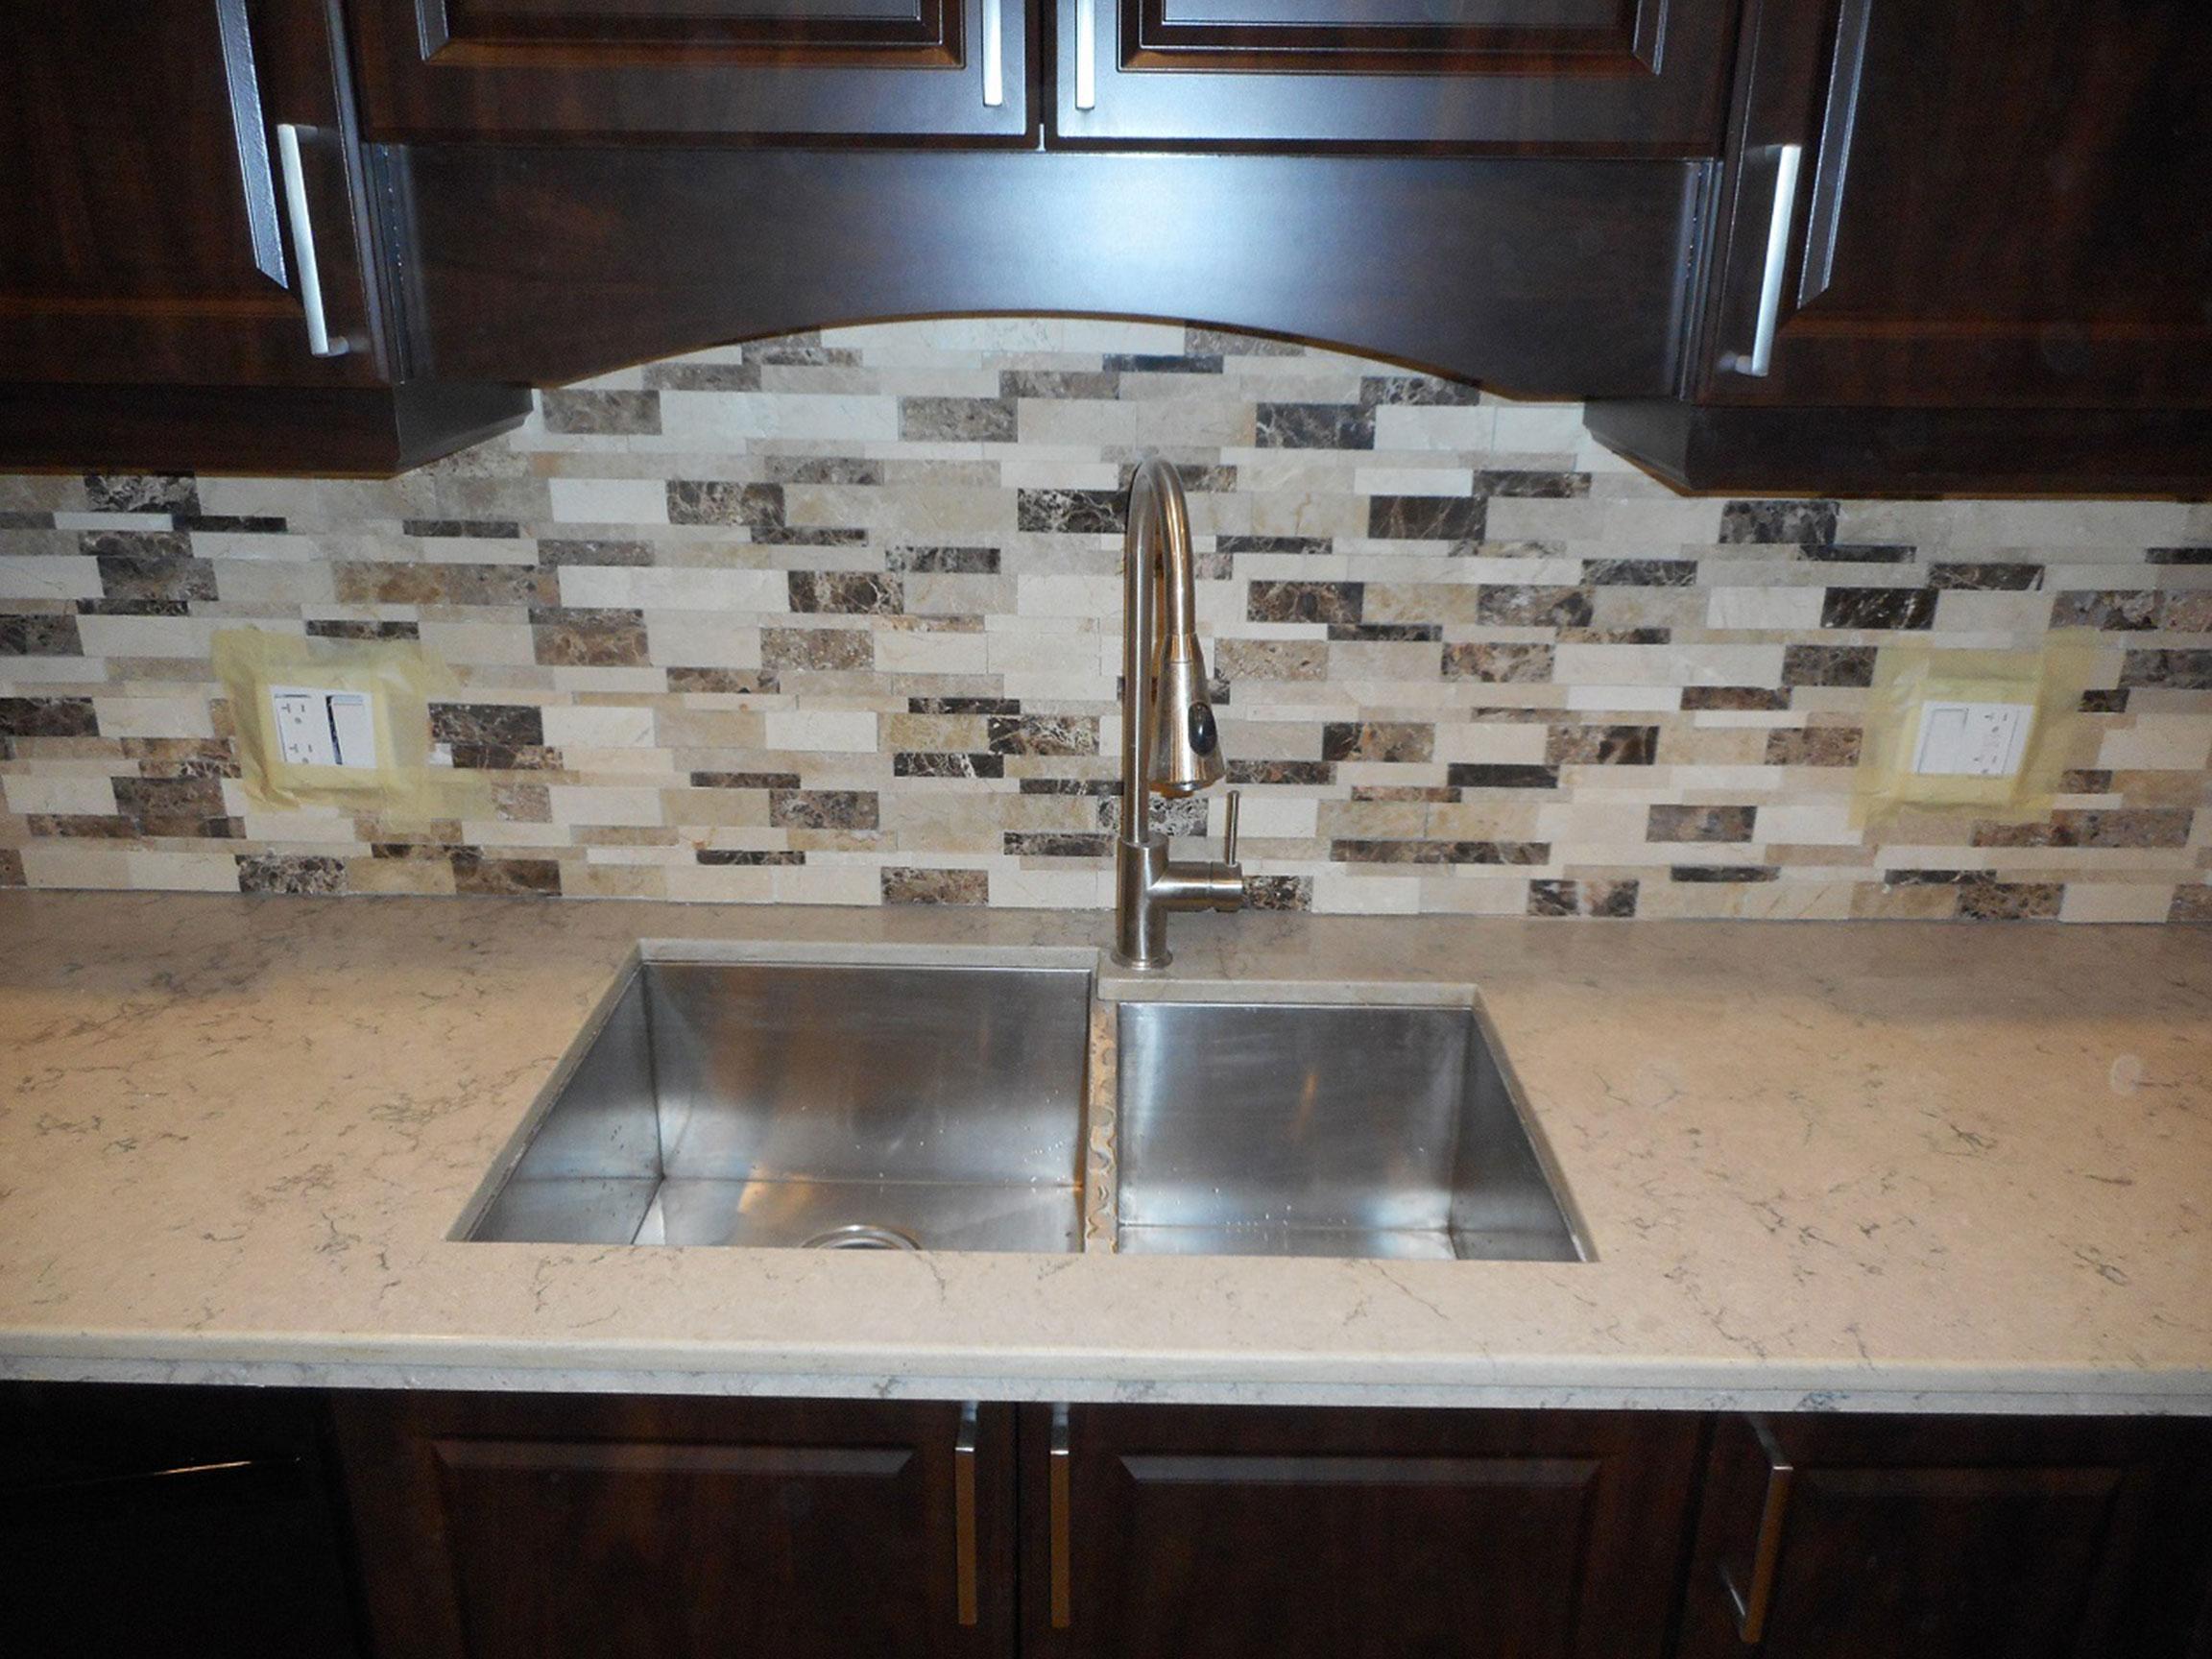 Kitchen Sink View After